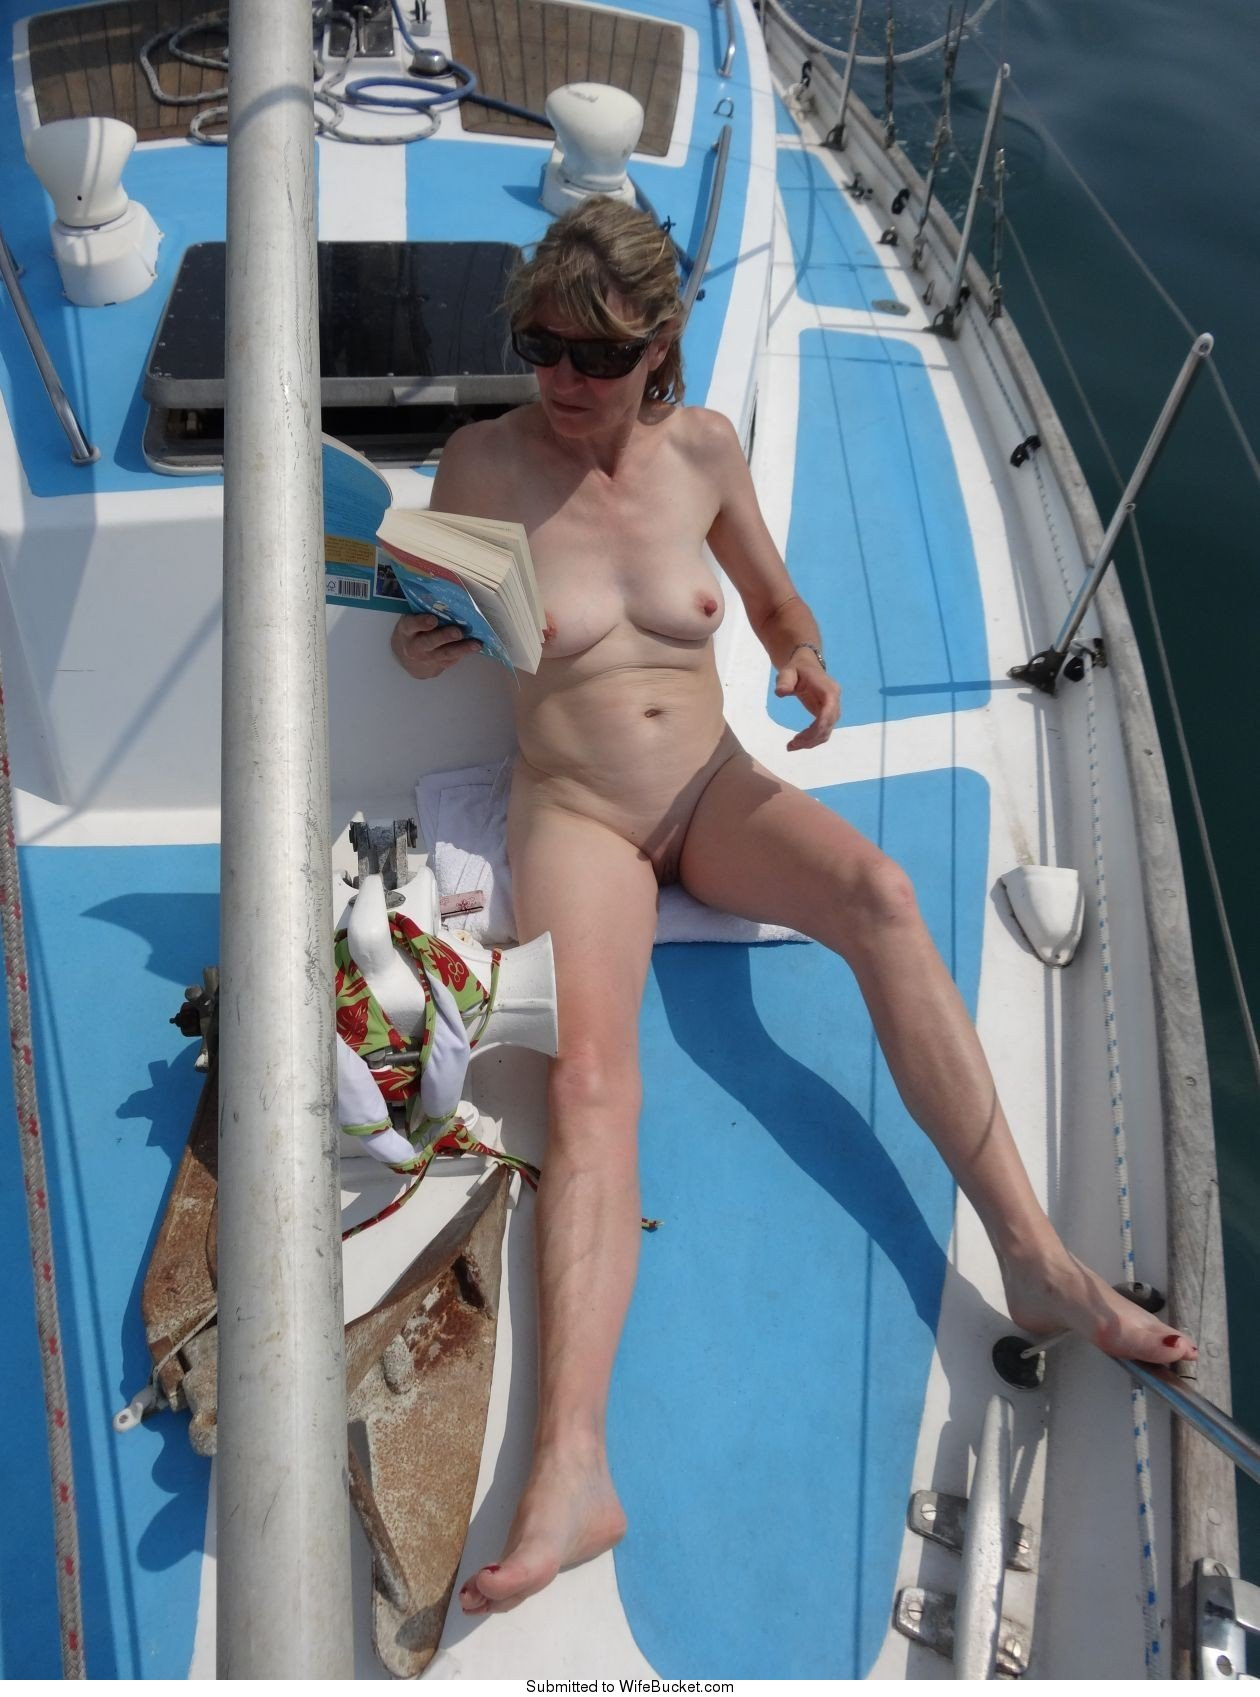 Amateur MILF naked pics